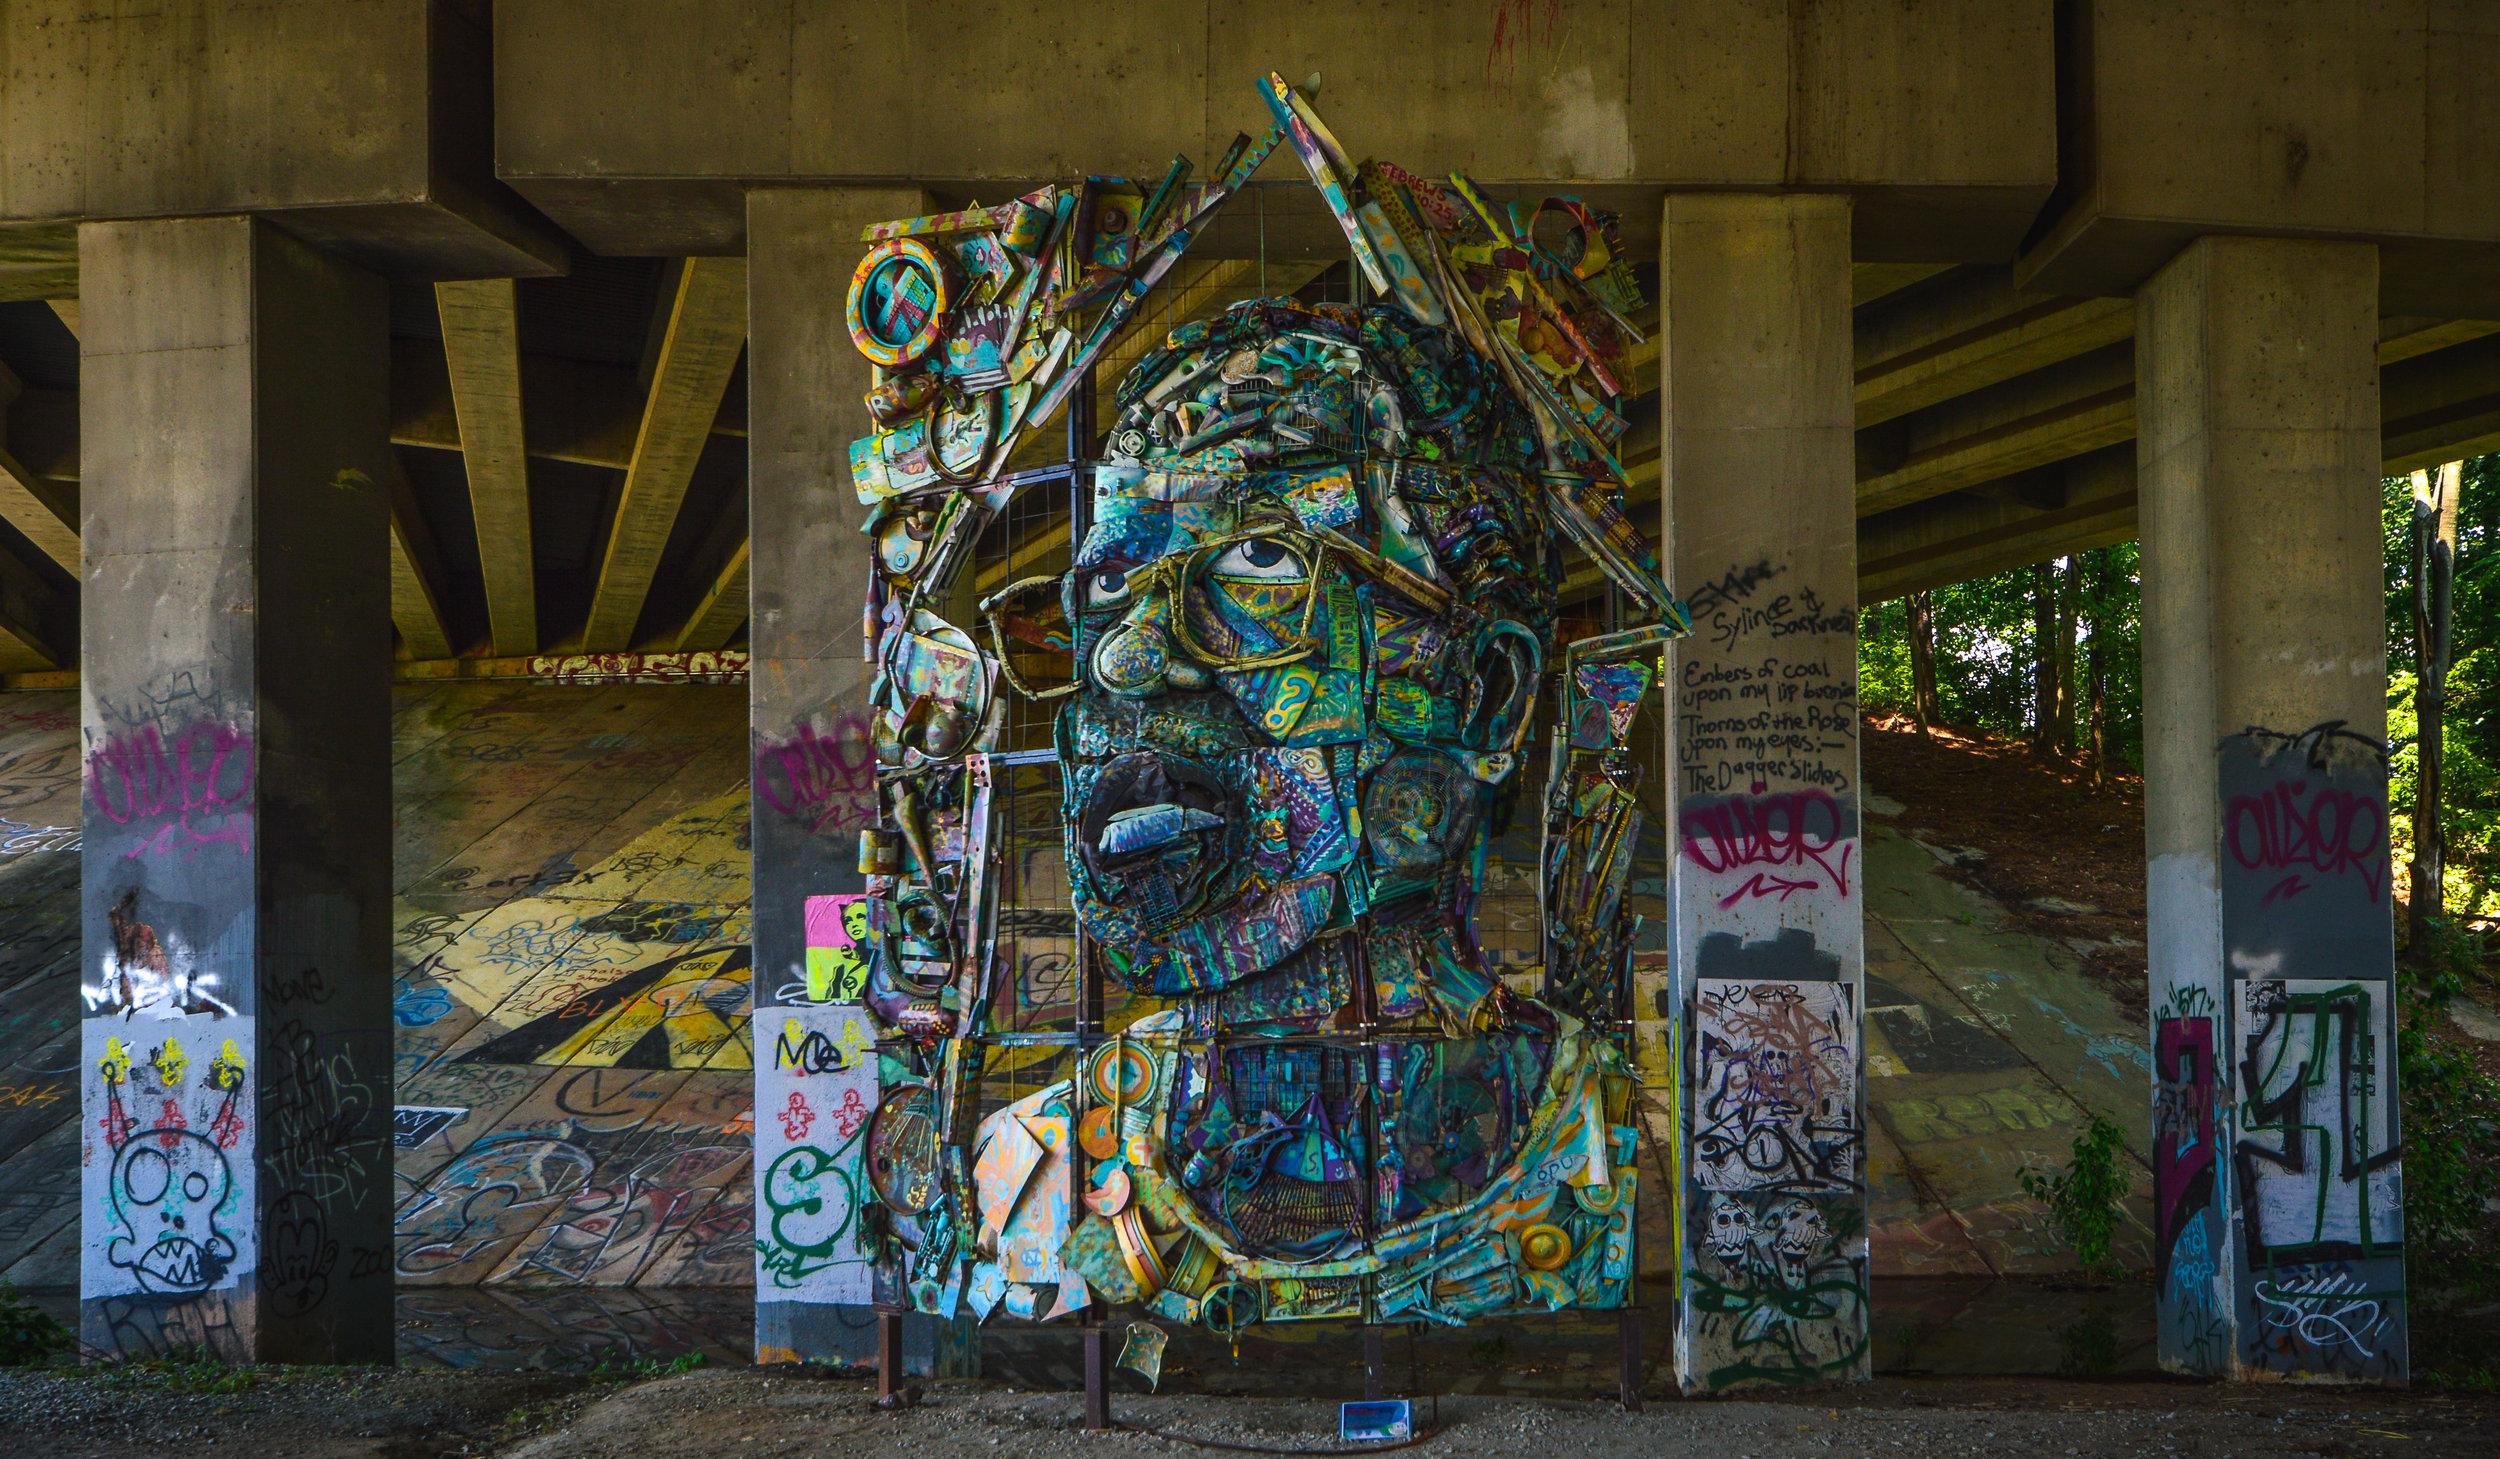 The Art of Reconciliation, William Massey -Eastside Beltline, 2015